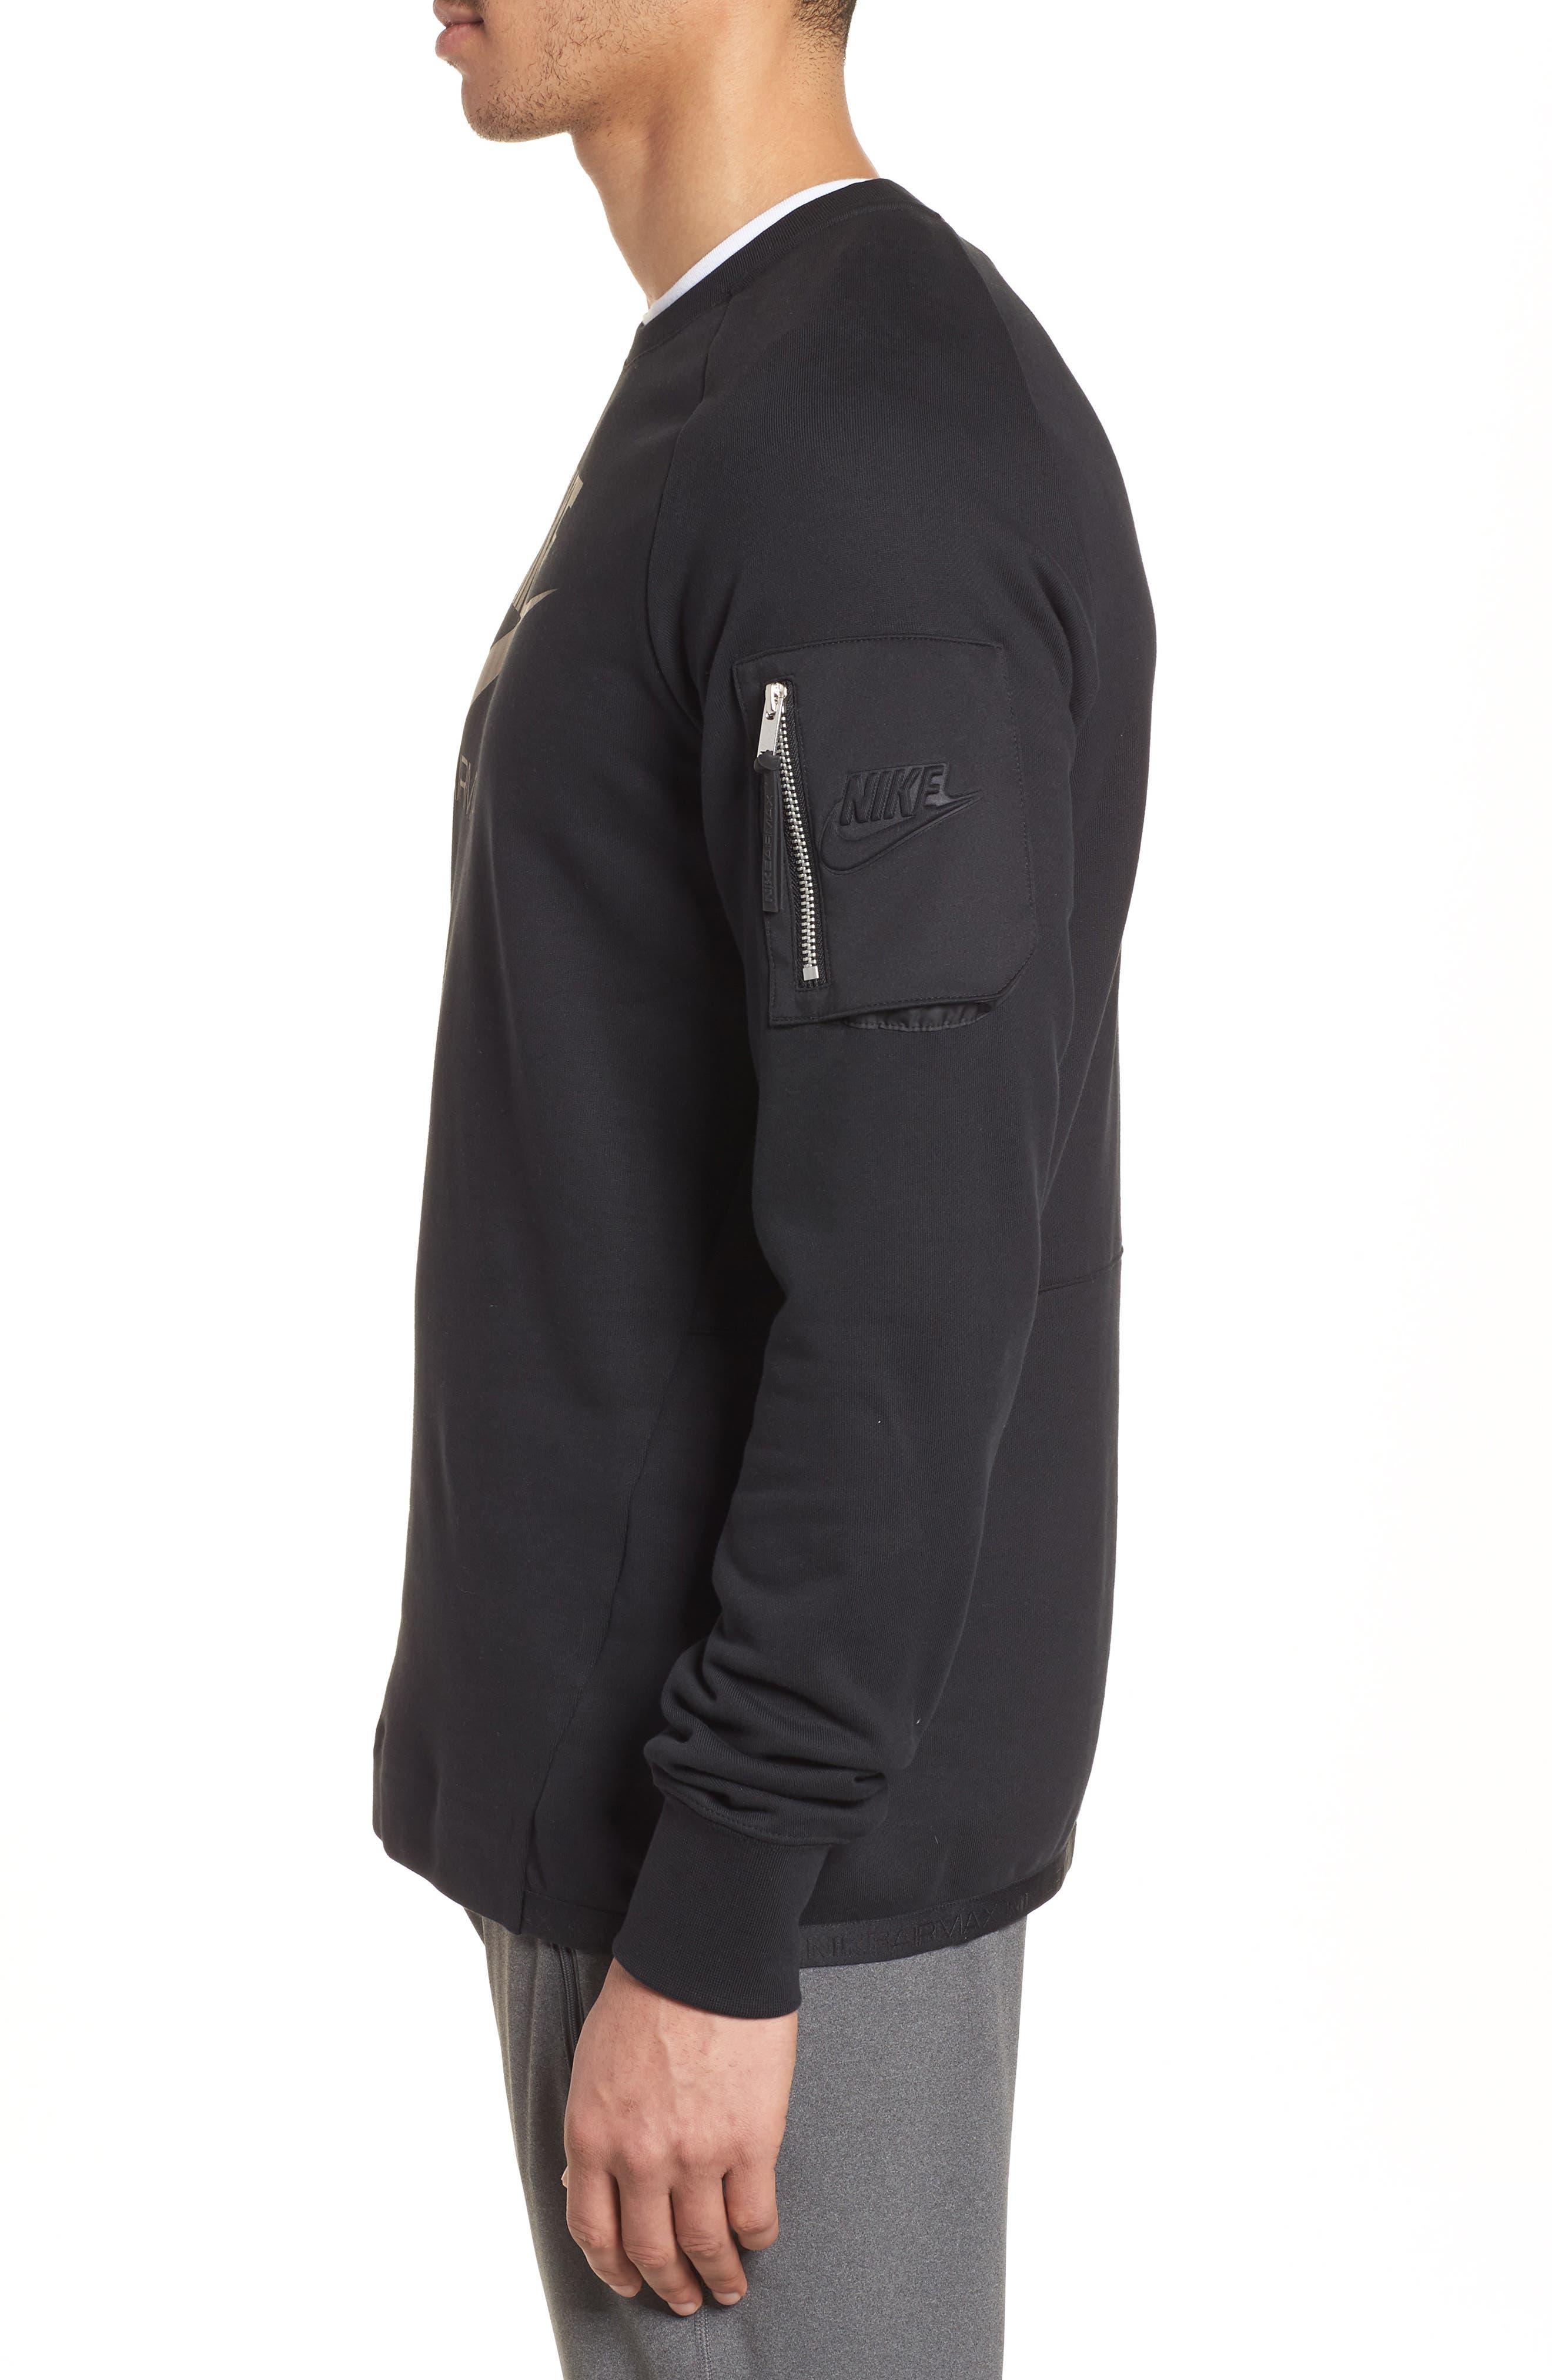 NSW Air Max Crewneck Sweatshirt,                             Alternate thumbnail 3, color,                             Black/ Black/ Black